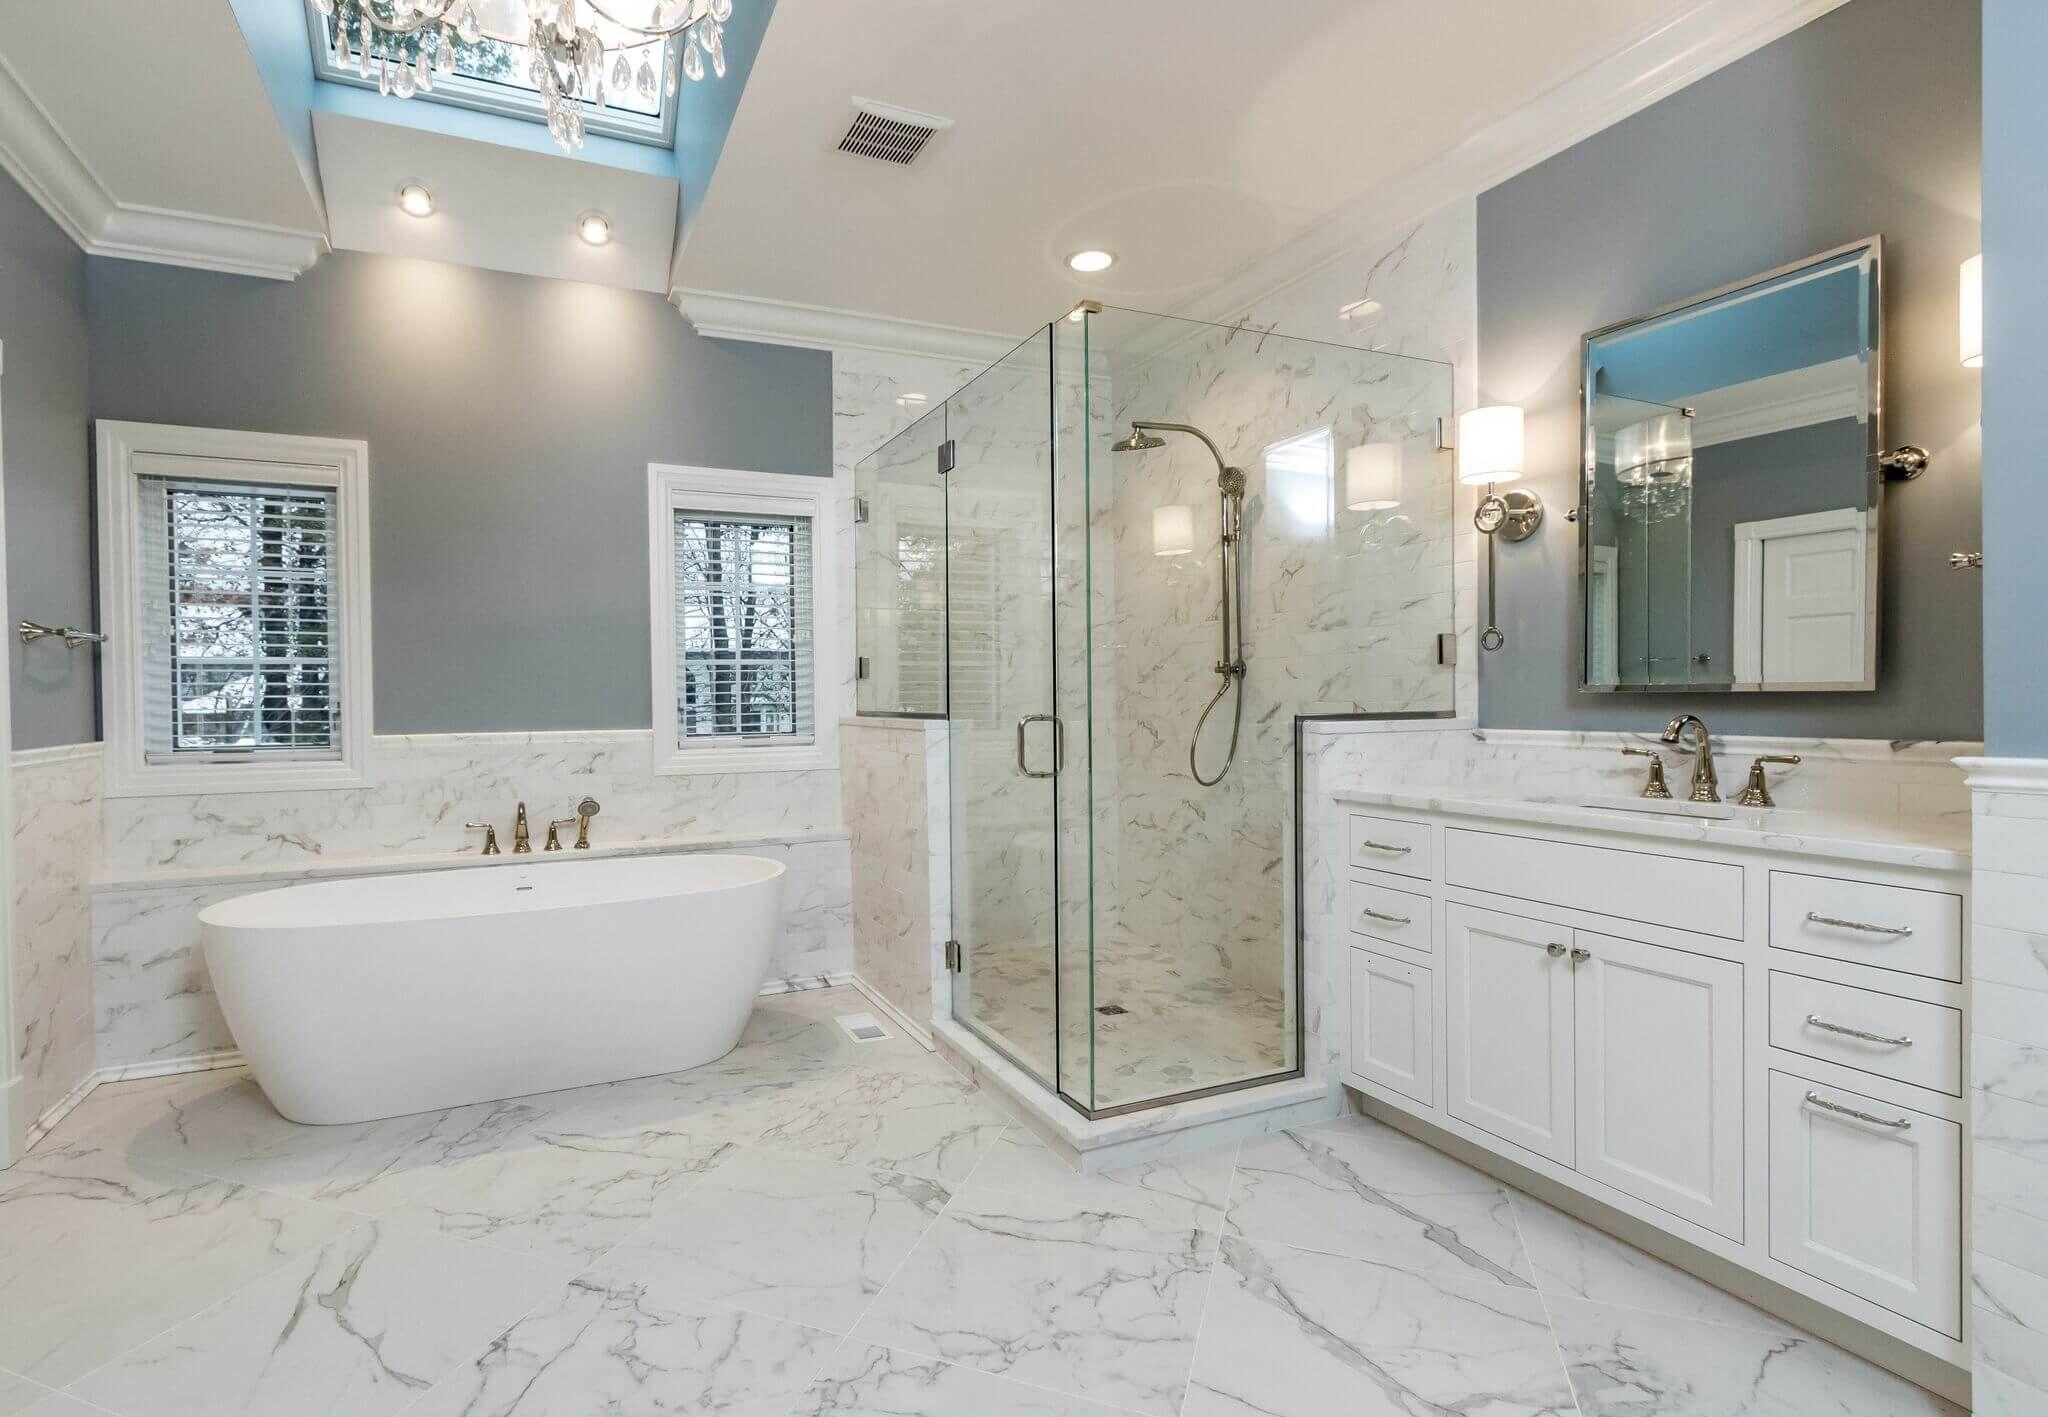 Luxury Master Bathroom Luxury Master Bathrooms Master Bath Renovation Renovation Design Upscale master bathrooms upscale